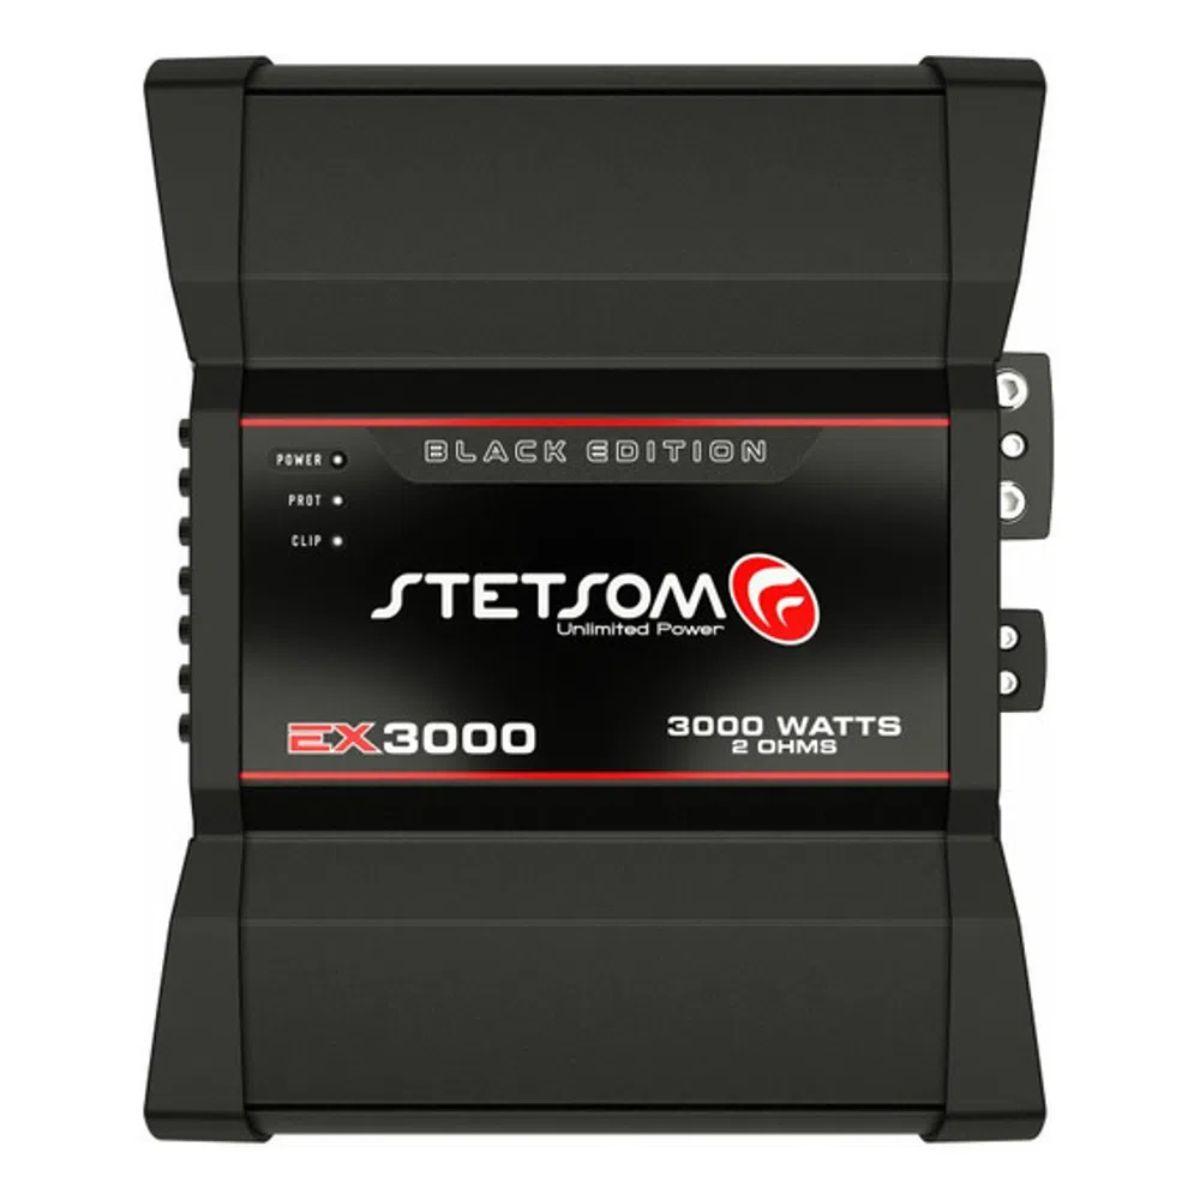 Módulo Amplificador Stetsom EX 3000 Black 3000W Rms 2 Ohms 1 Canal